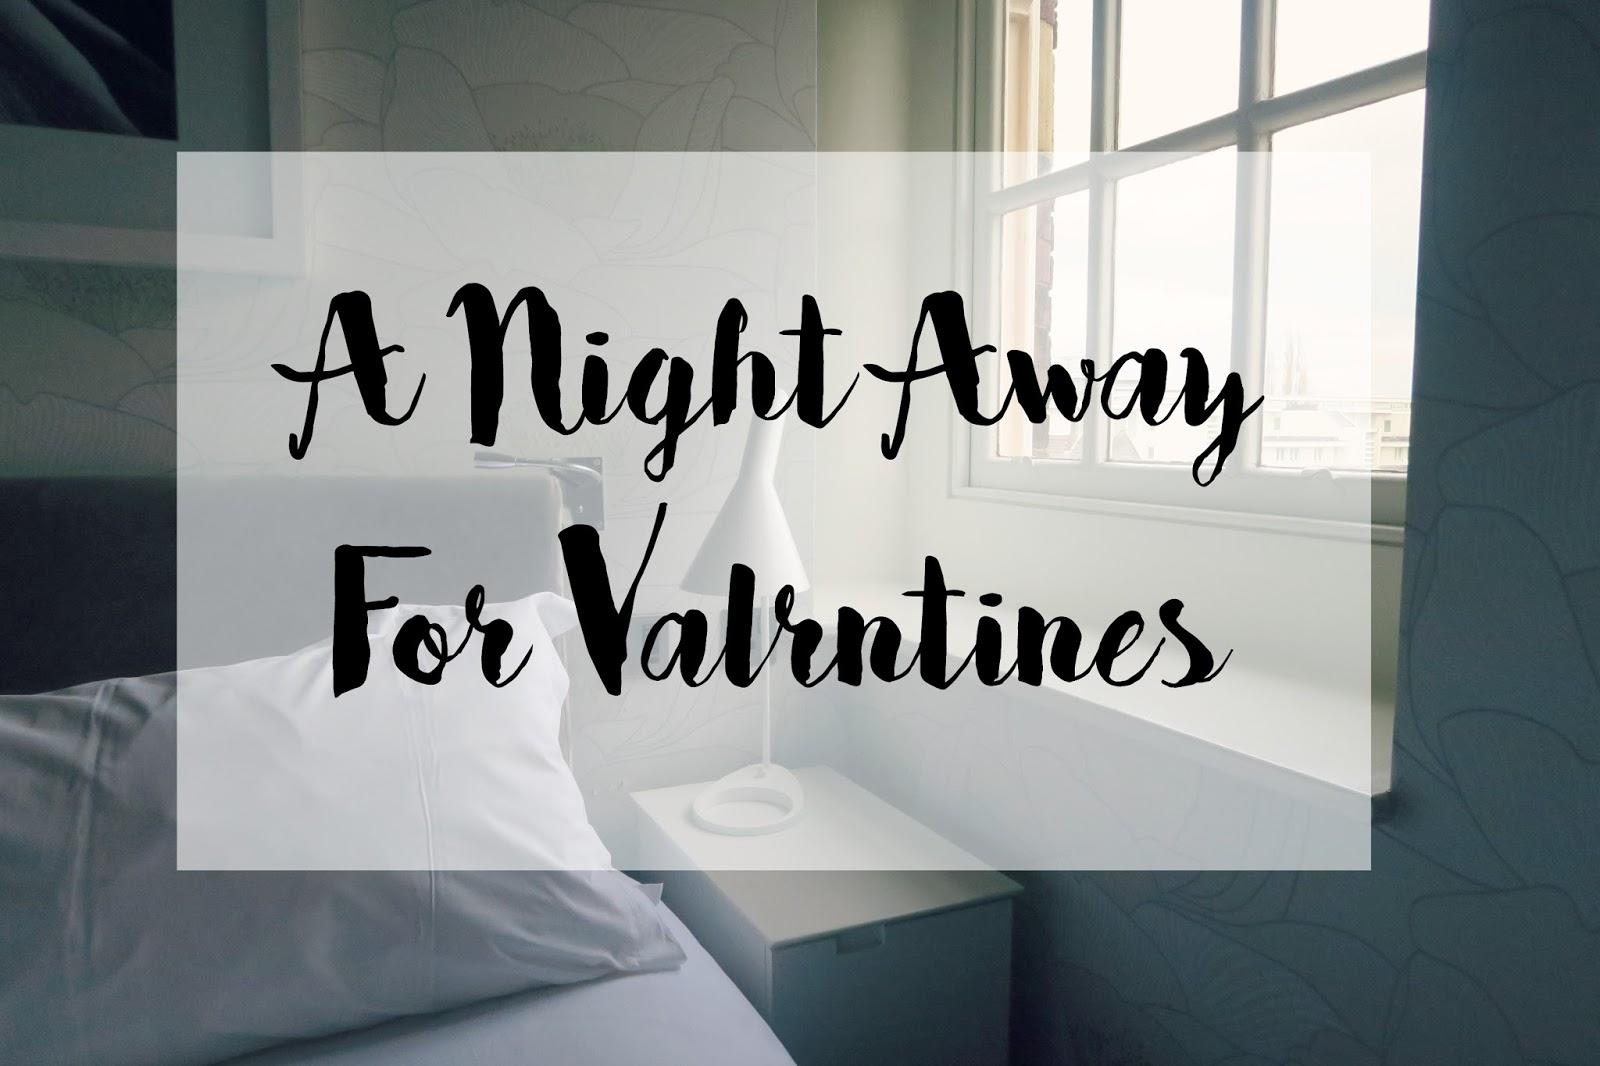 Valentines night away deals